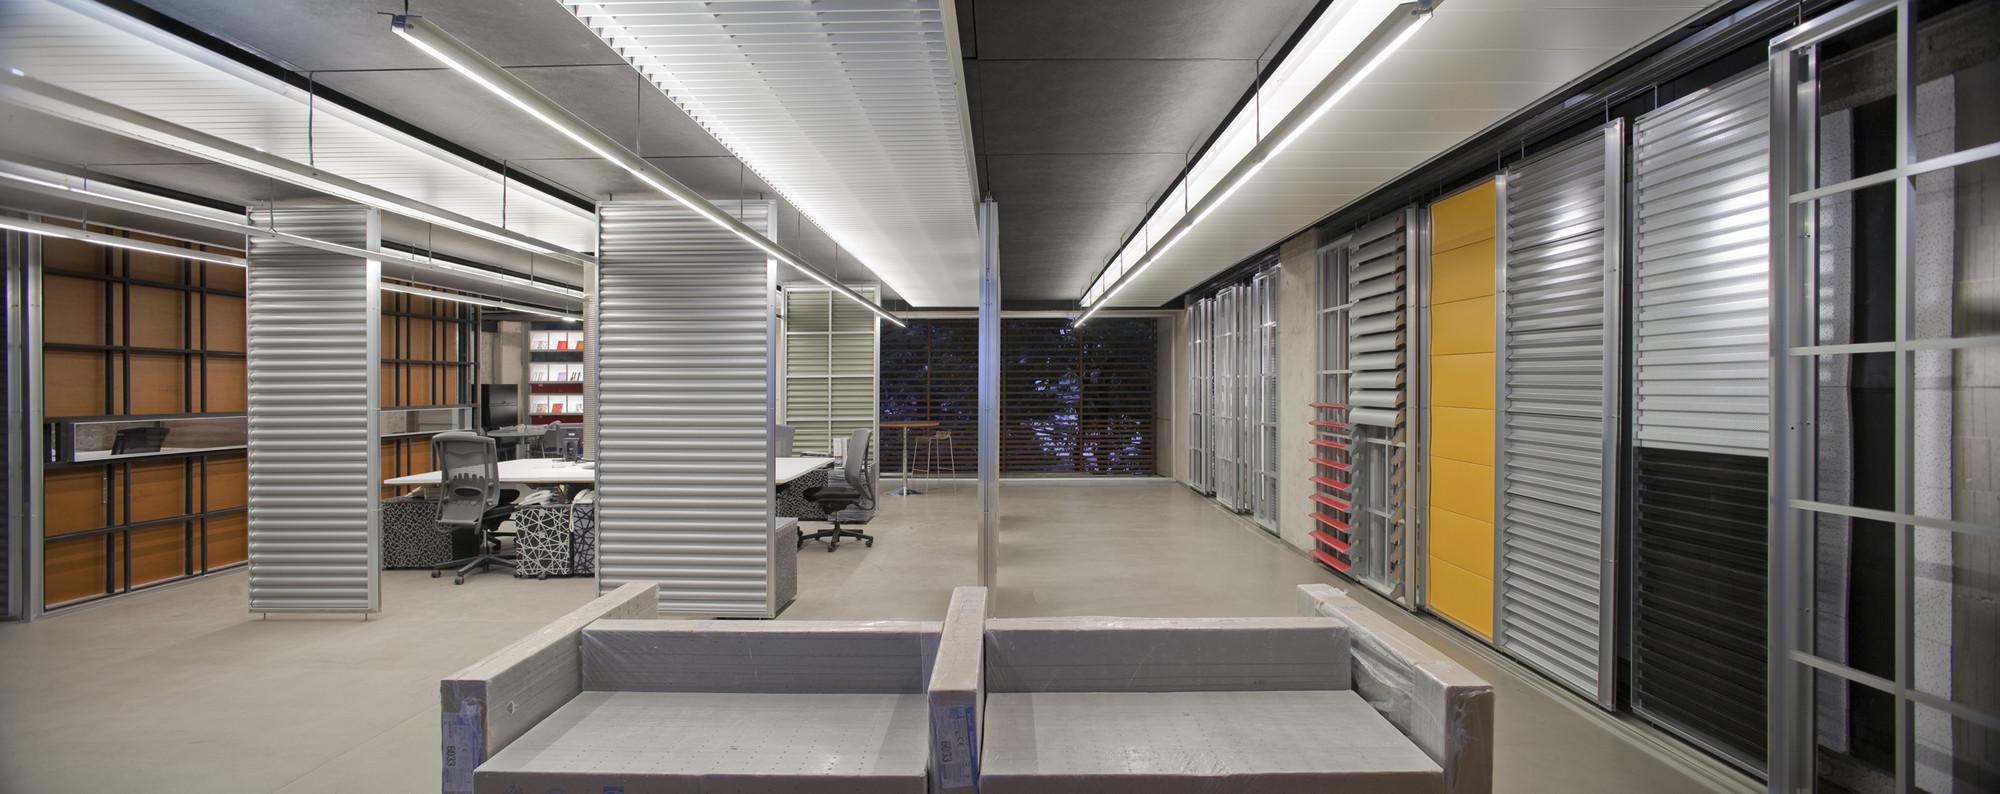 Showroom hunter douglas serrano monjaraz arquitectos for Decoracion contemporanea interiores